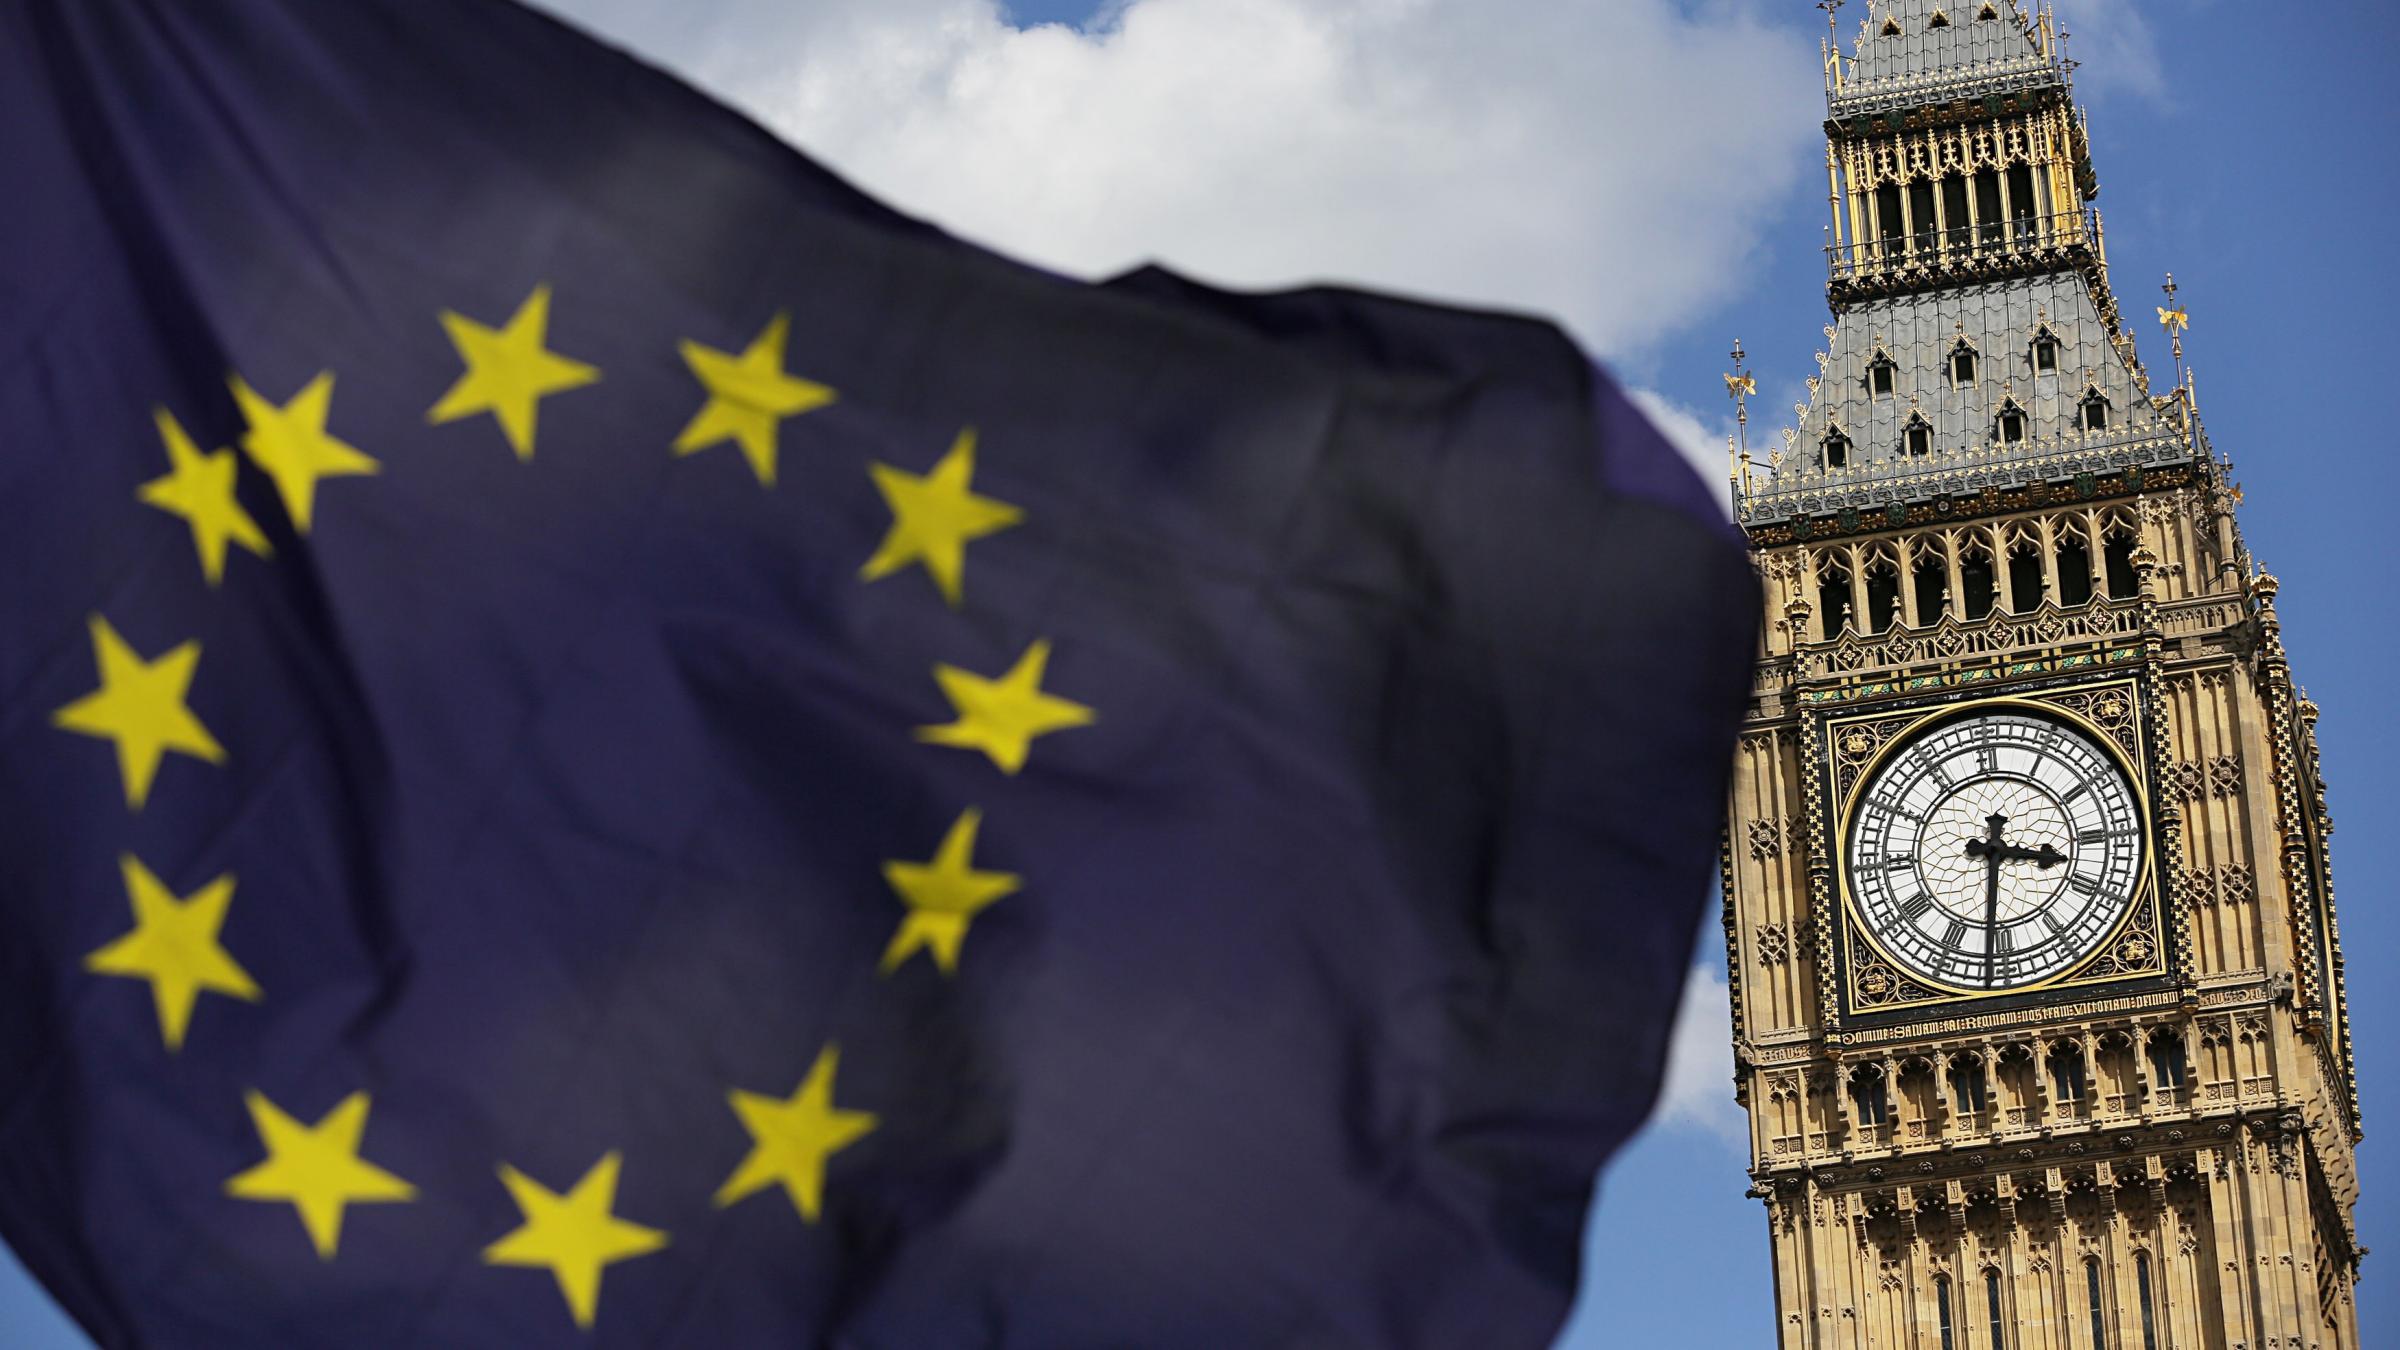 Boris Johnson denies plot to topple UK PM Theresa May